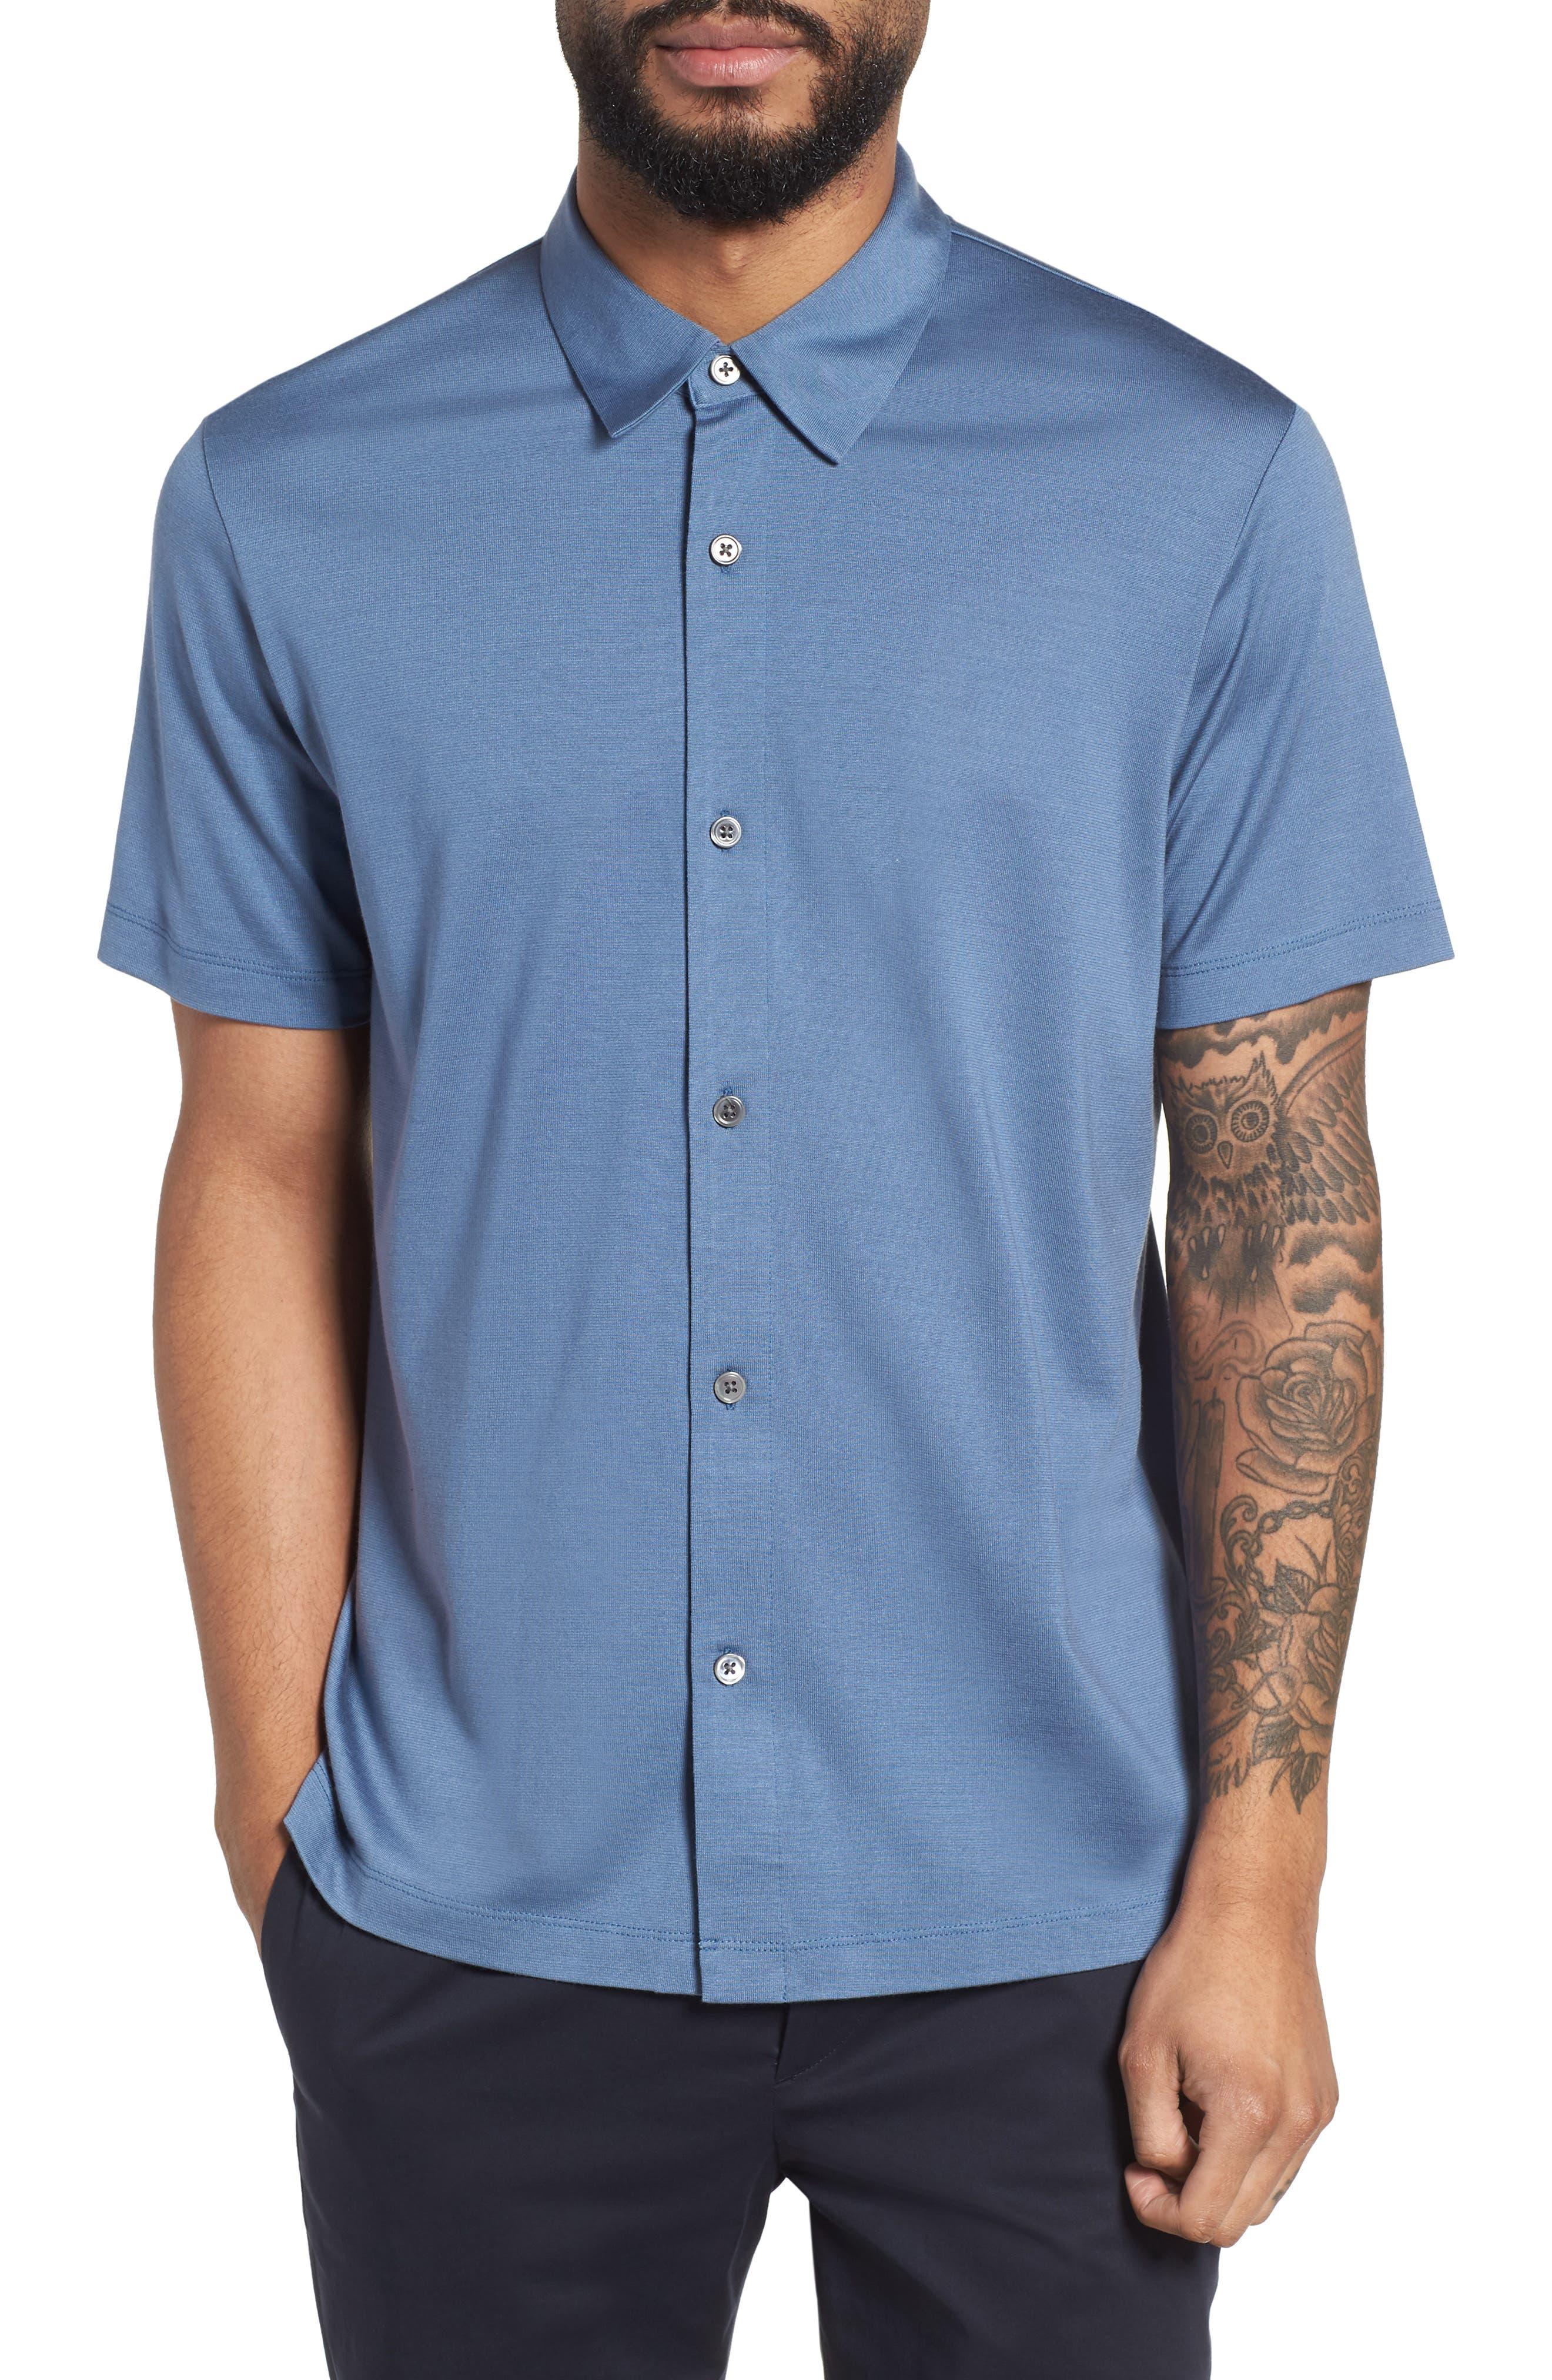 Incisive Silk & Cotton Short Sleeve Sport Shirt,                             Main thumbnail 1, color,                             Iris